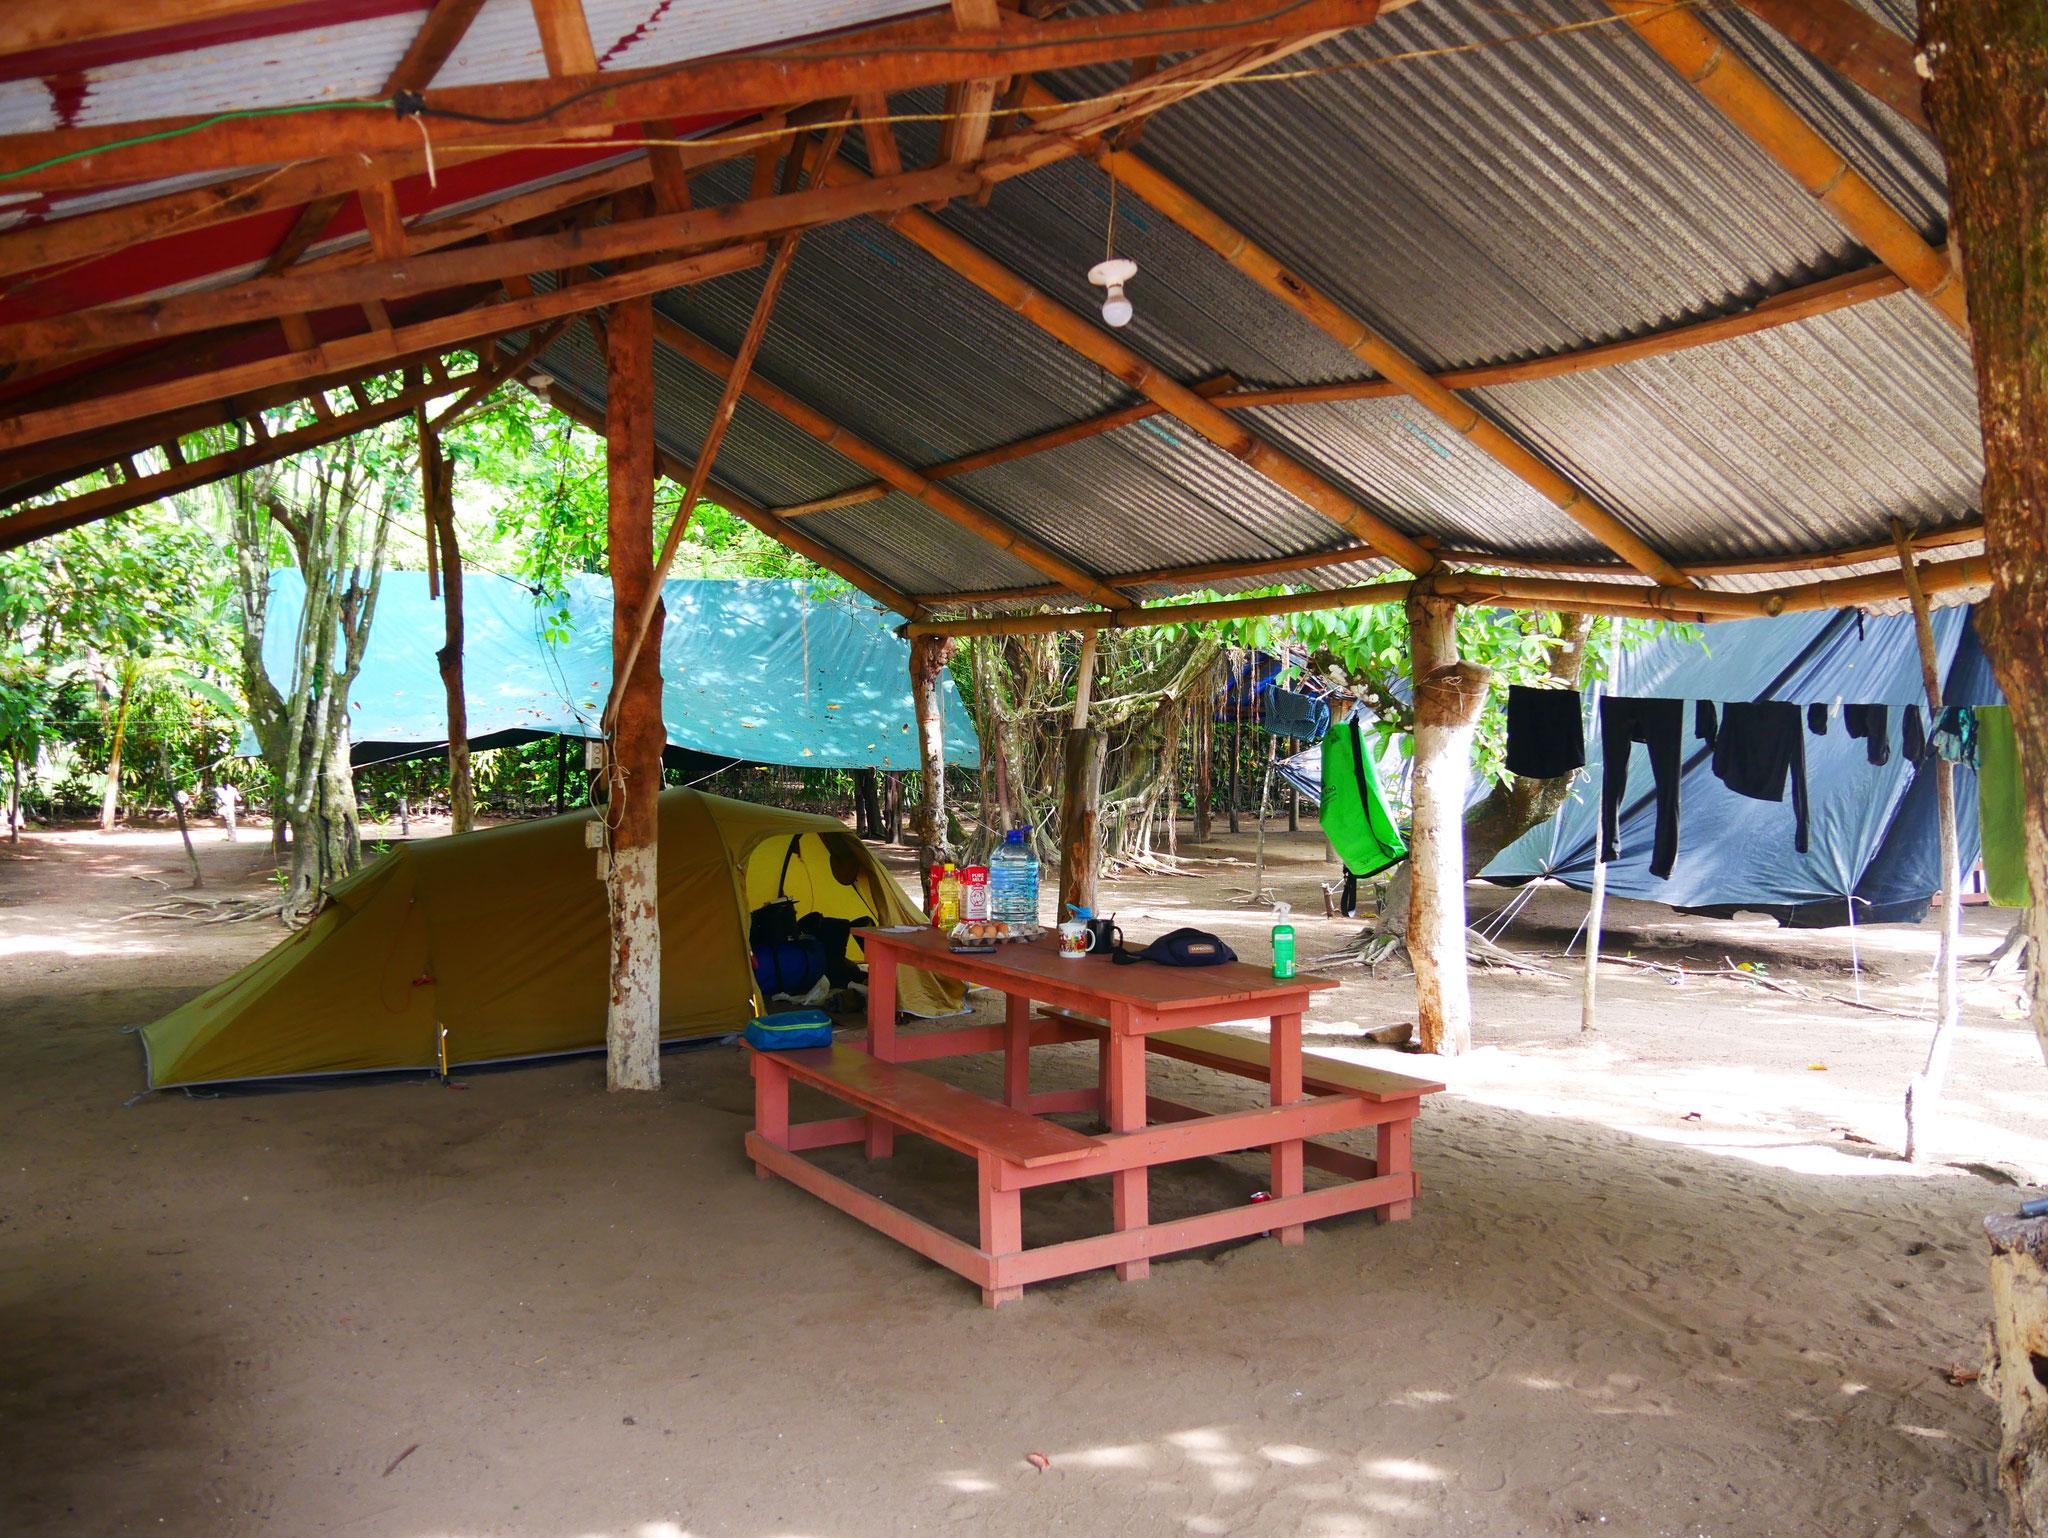 Campground in Uvita